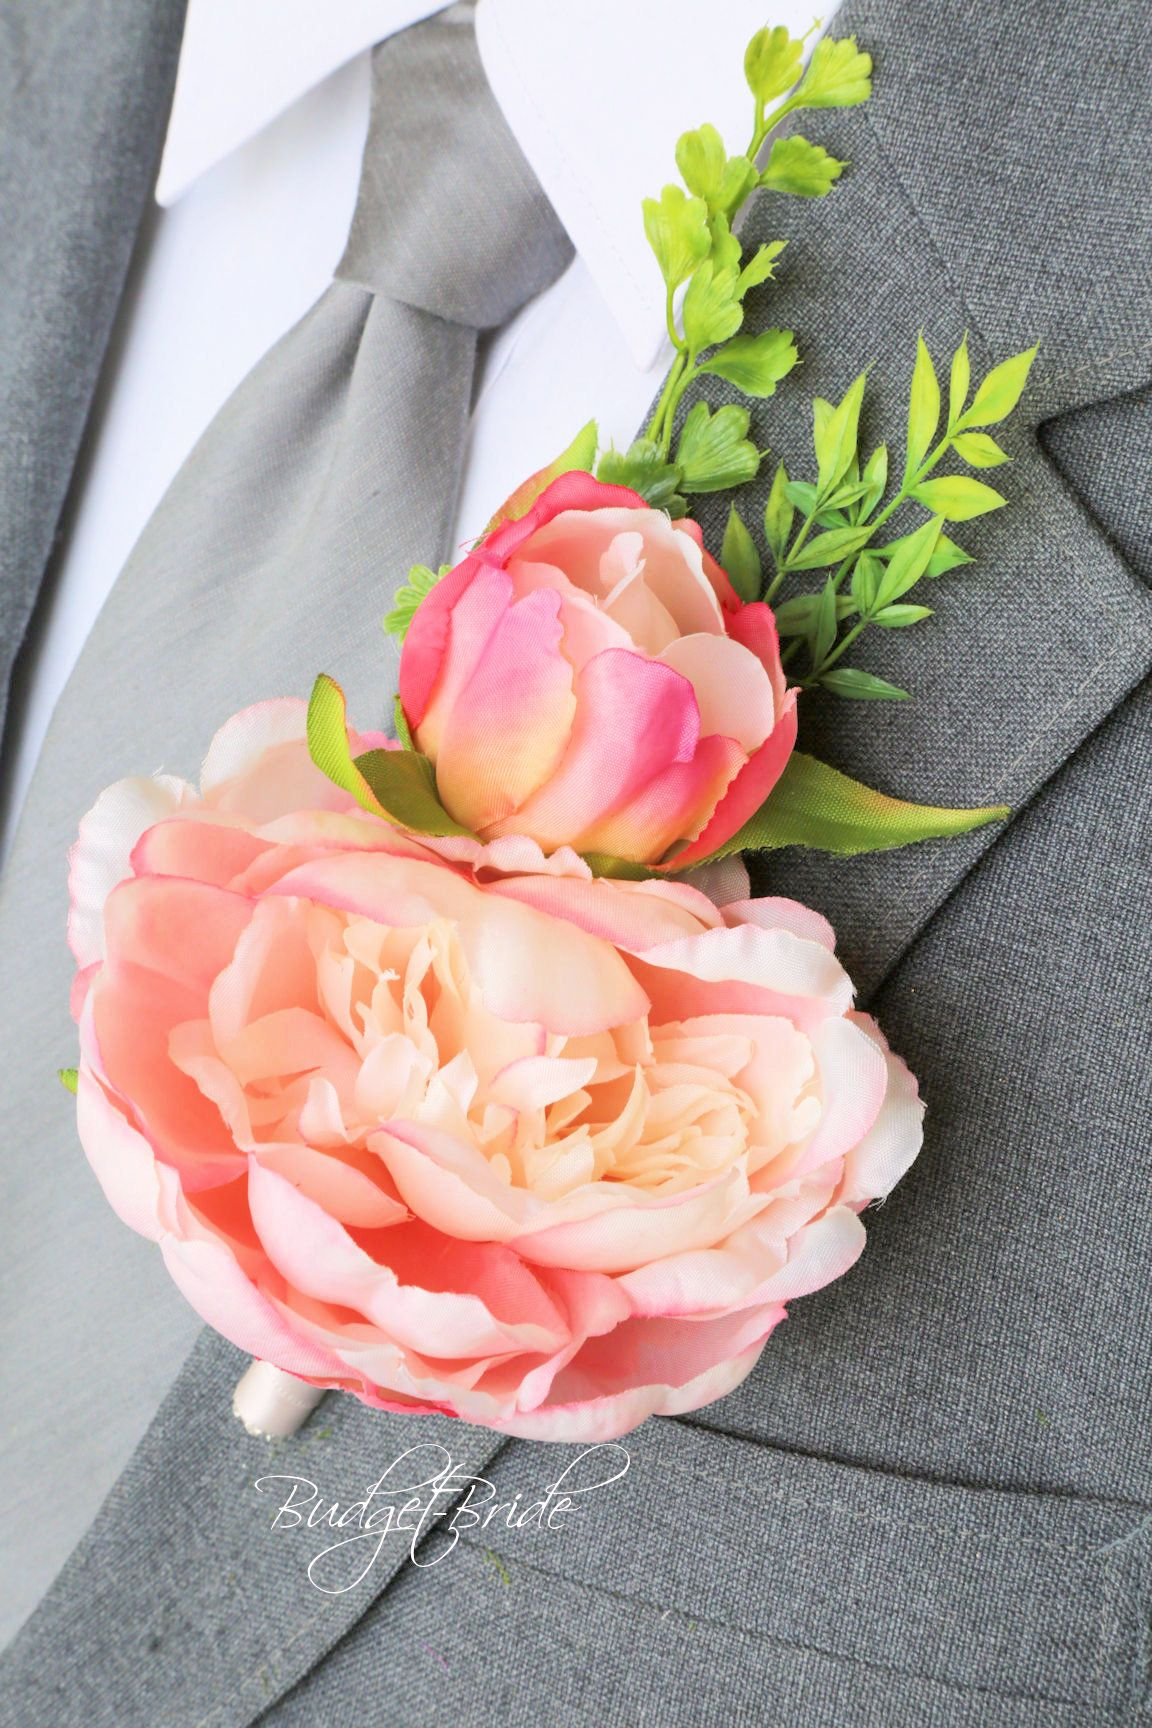 Blush Davids Bridal Wedding Flowers Pink Peony Boutonniere Grey Suit